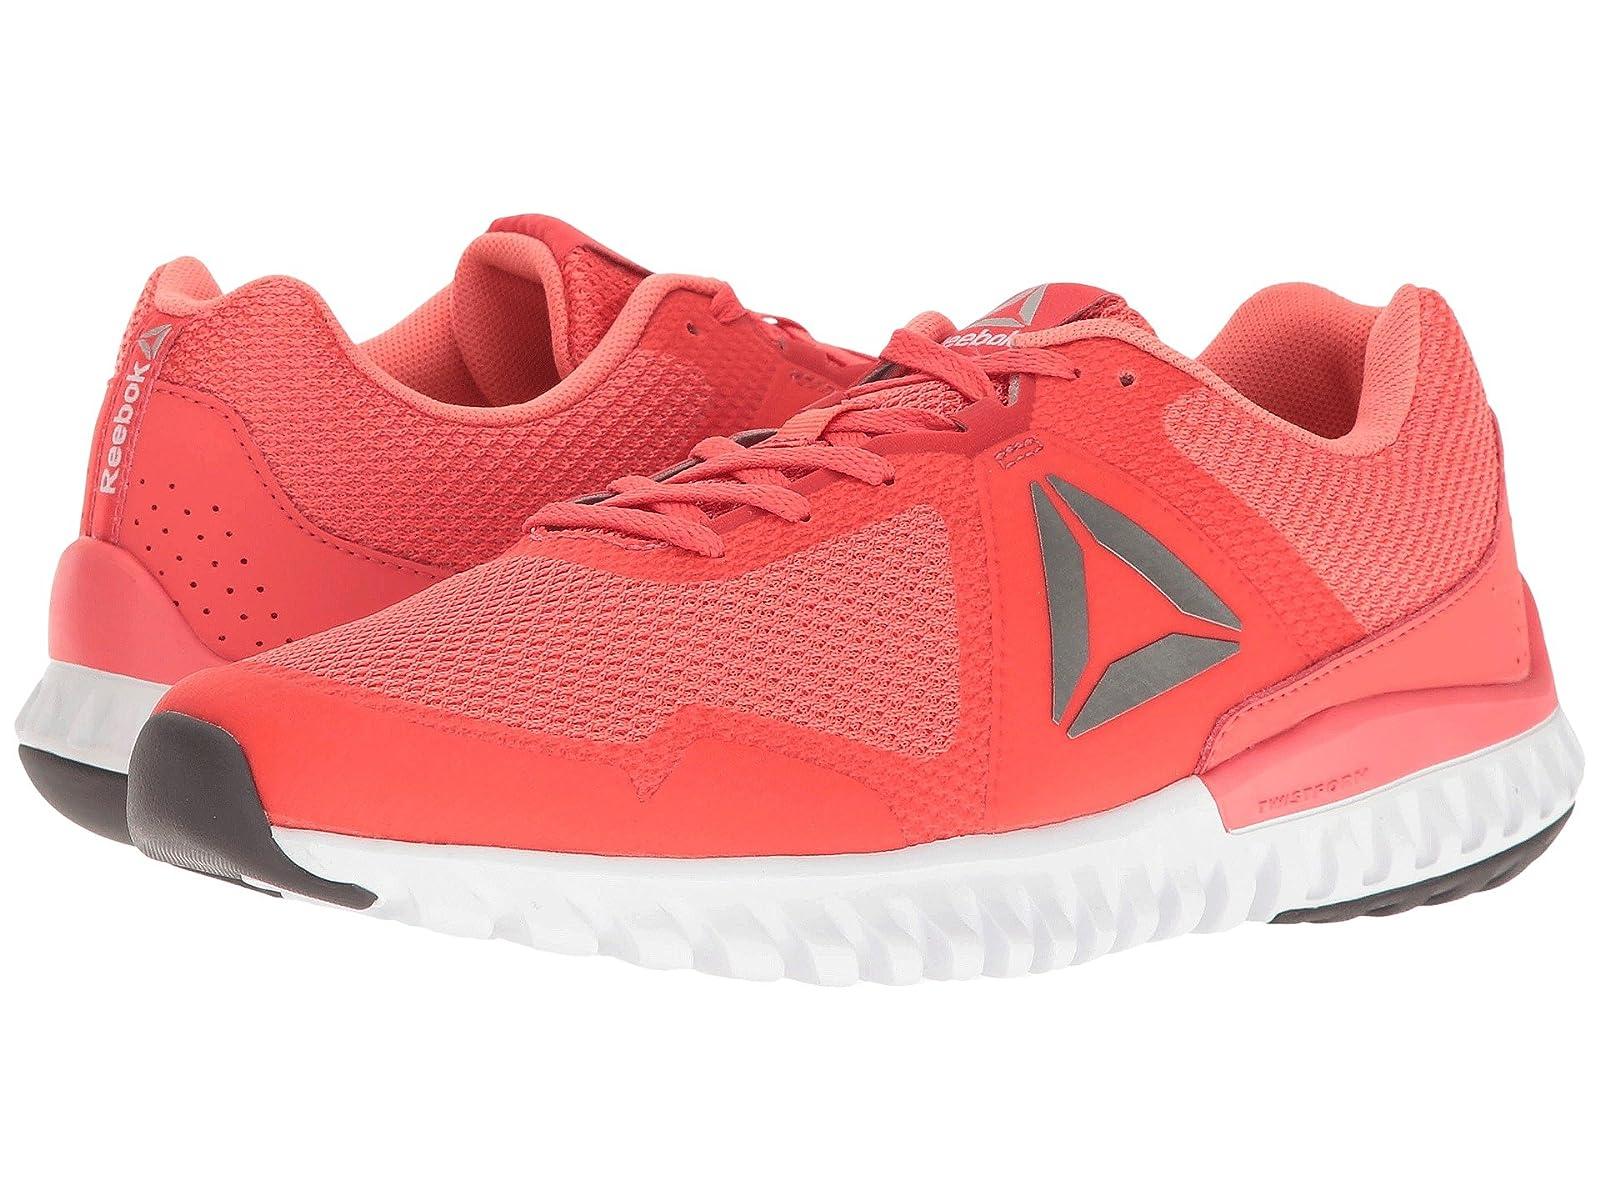 Reebok Twistform Blaze 3.0 MTMCheap and distinctive eye-catching shoes